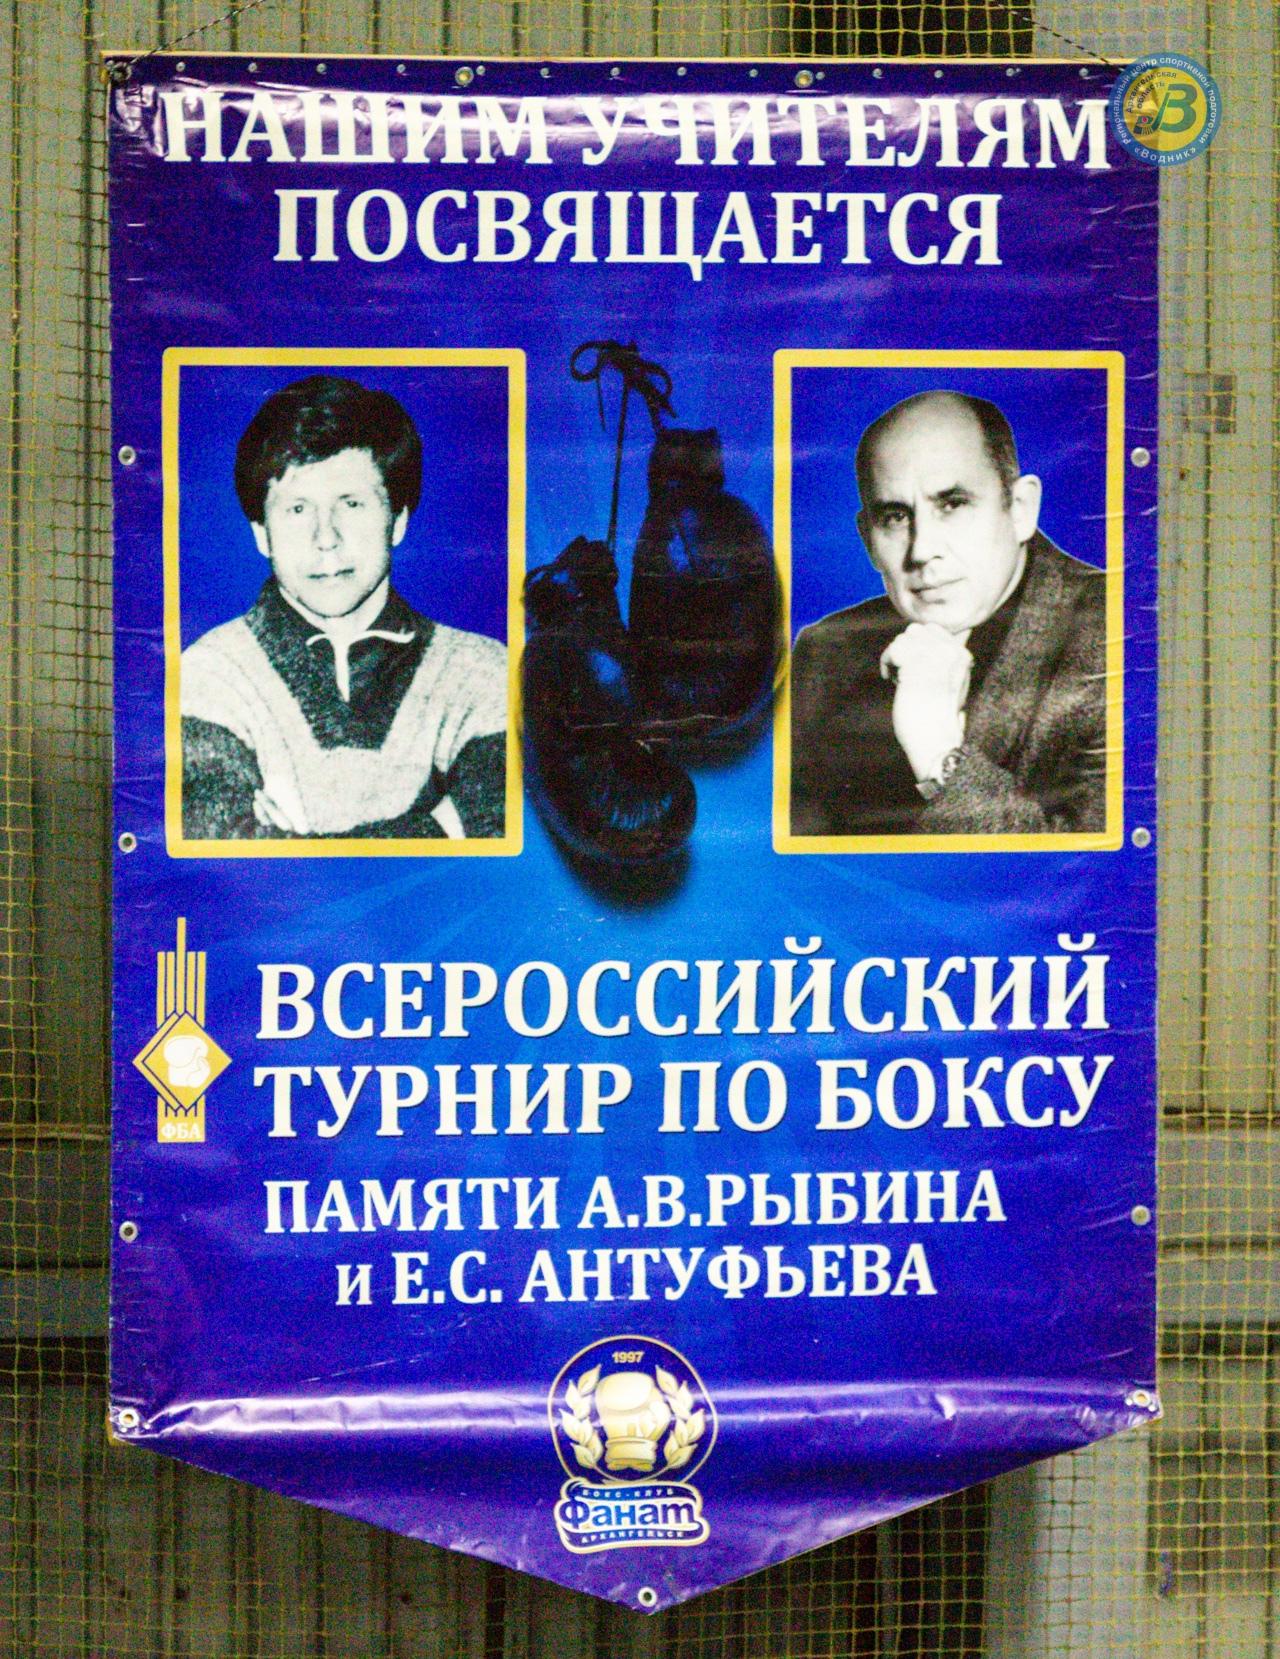 турнир памяти Рыбина и Антуфьева 2019_9